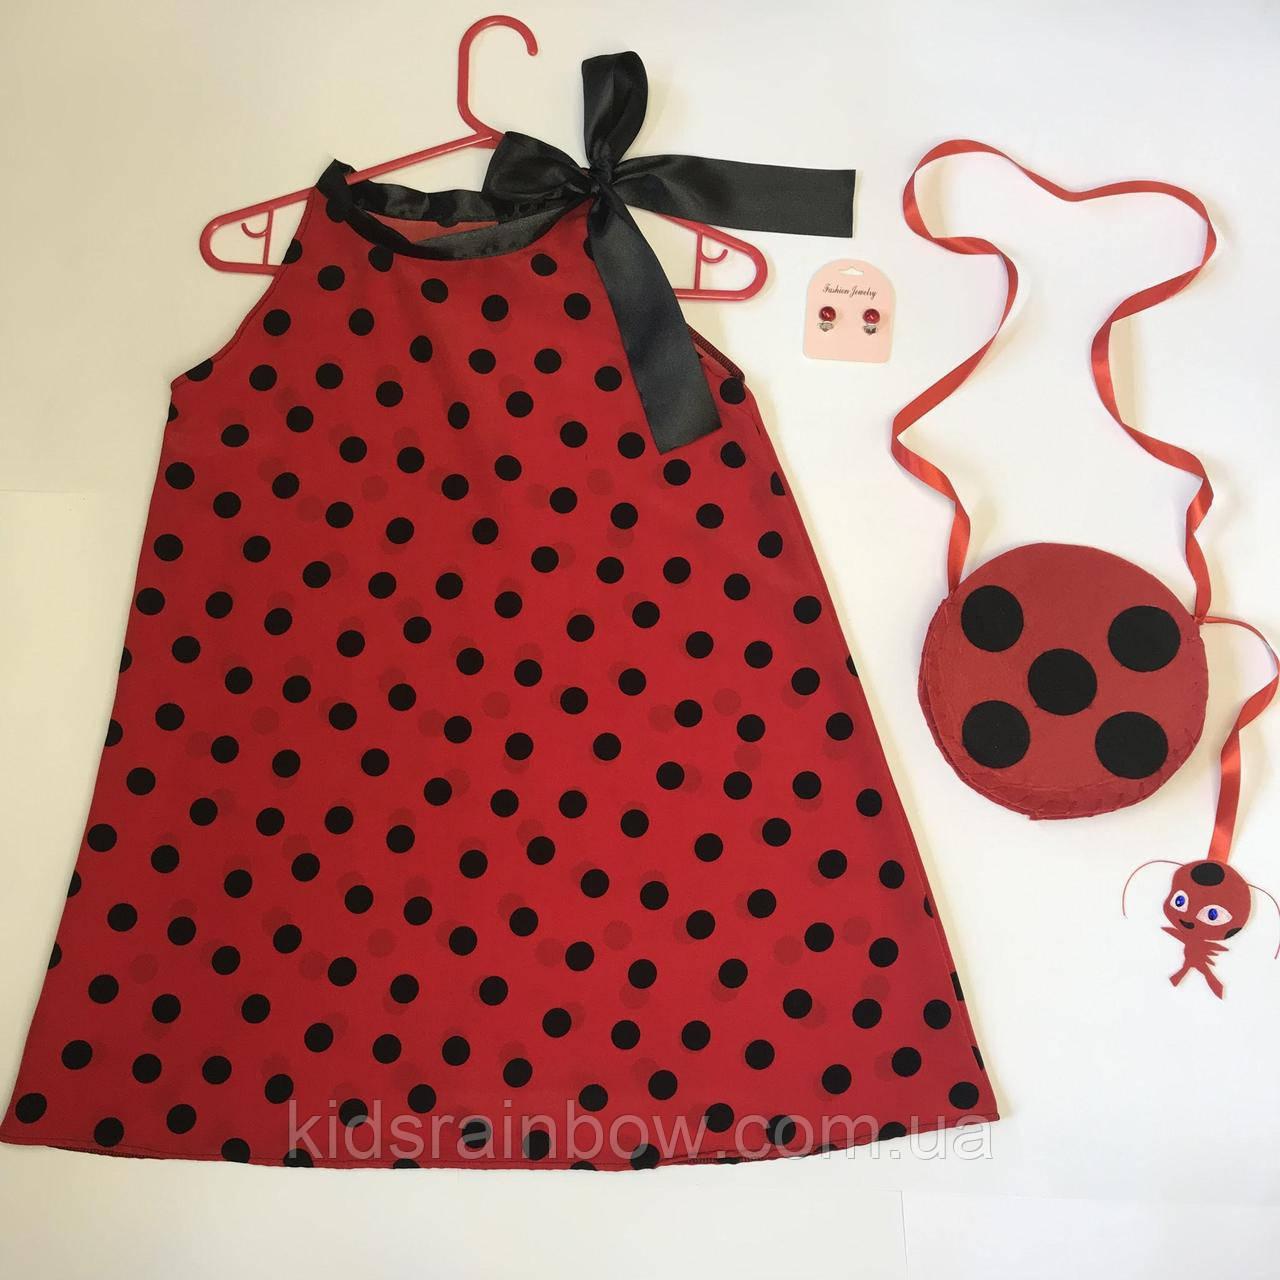 Платье Леди Баг с набором: клипсы, сумочка, Тикки